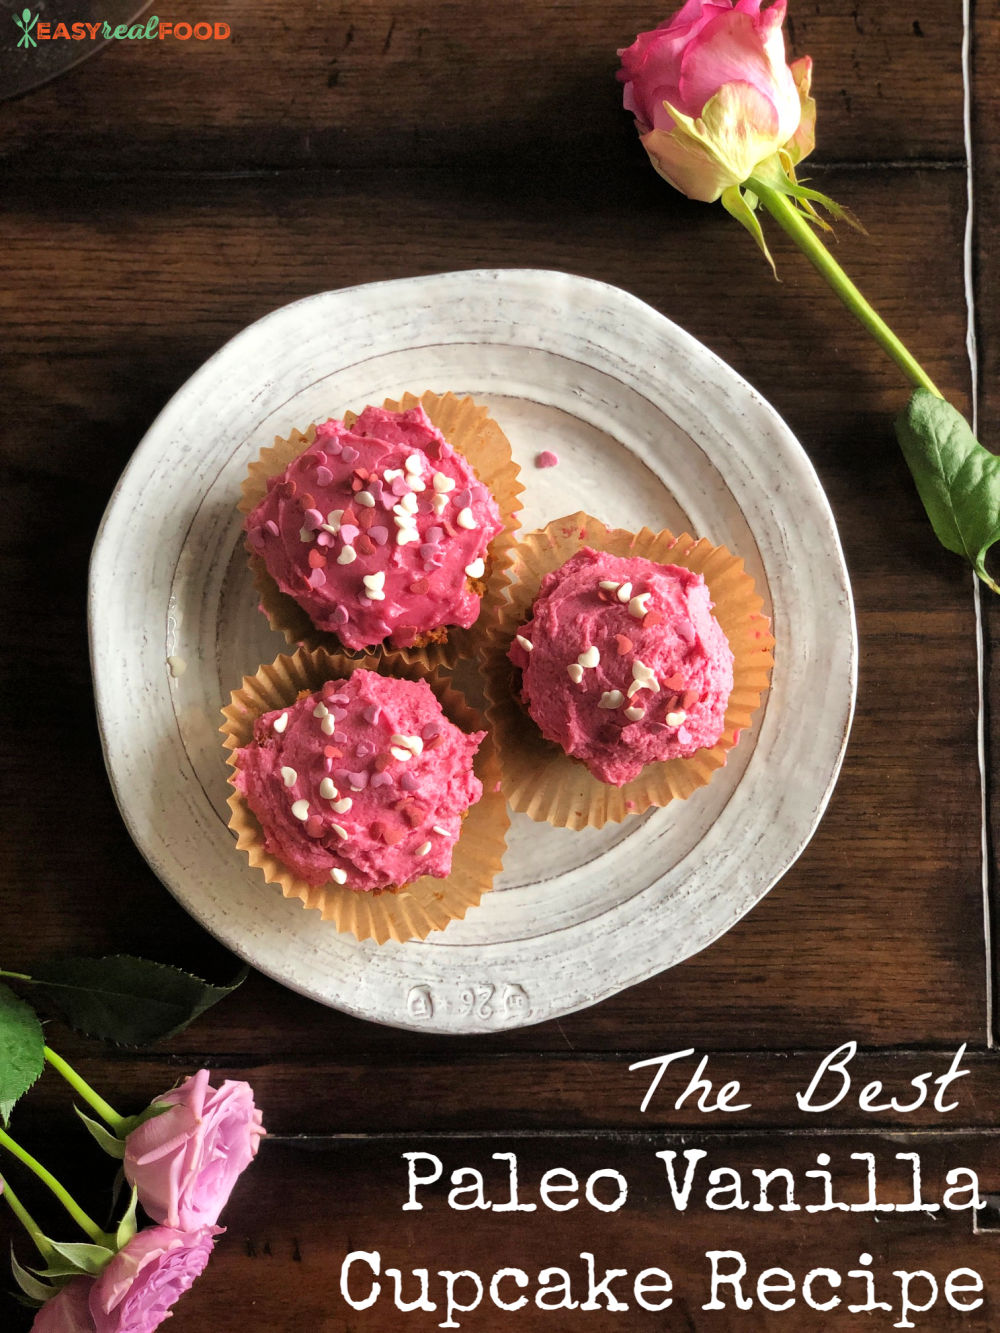 Paleo coconut flour vanilla cupcakes - grain free and vegan, these are moist and delicious cupcakes. Yum! #grainfree #vegantreat #glutenfreecupcake